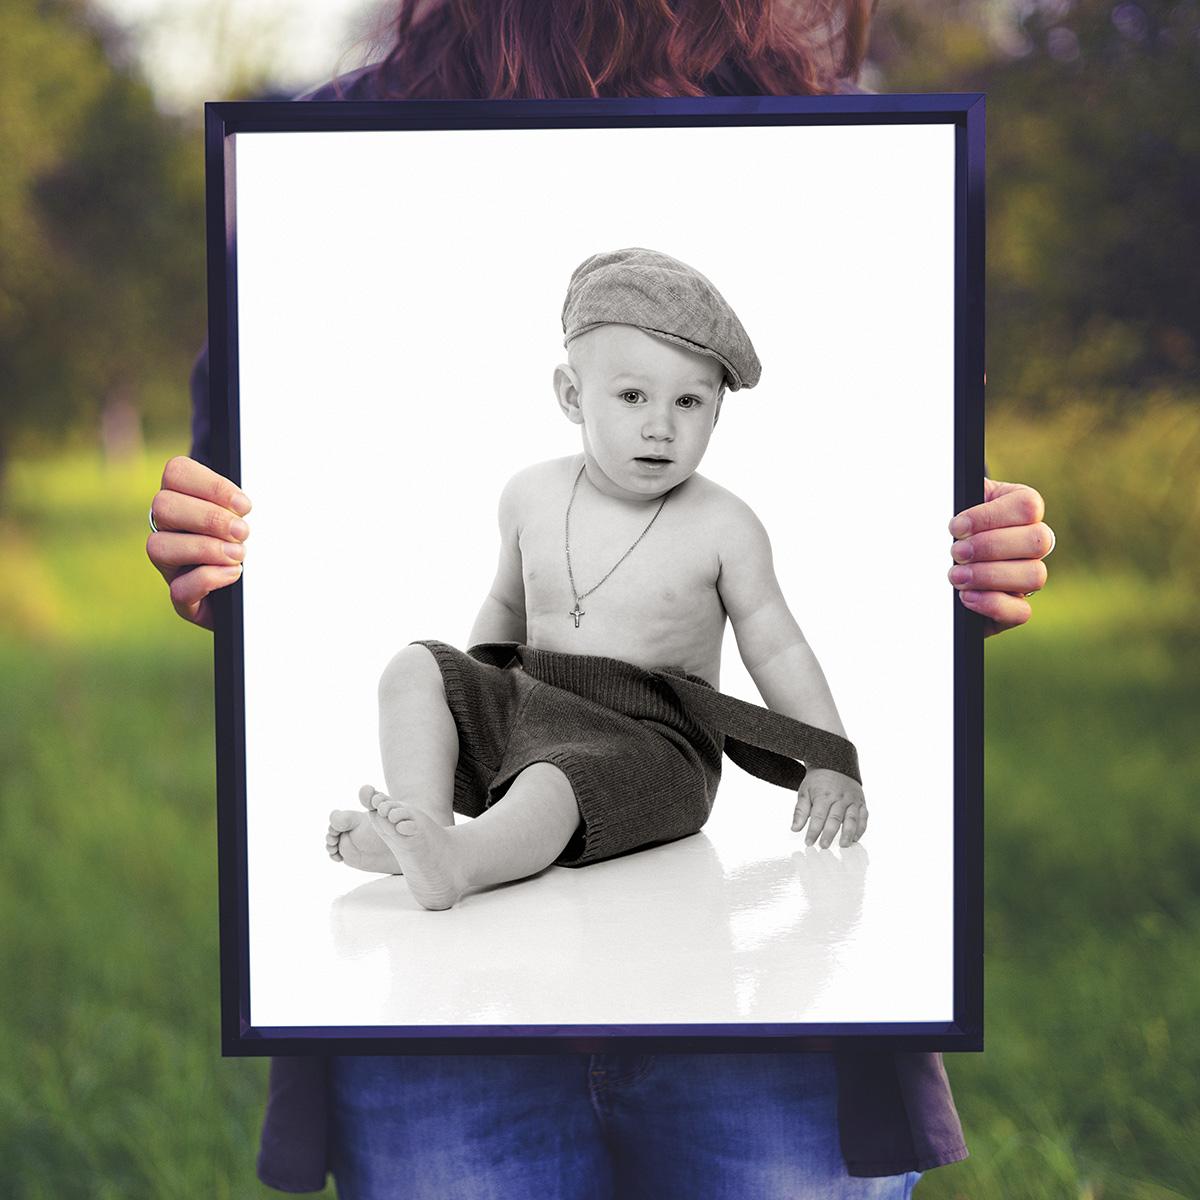 Nyhet! Gratis babyfotografering